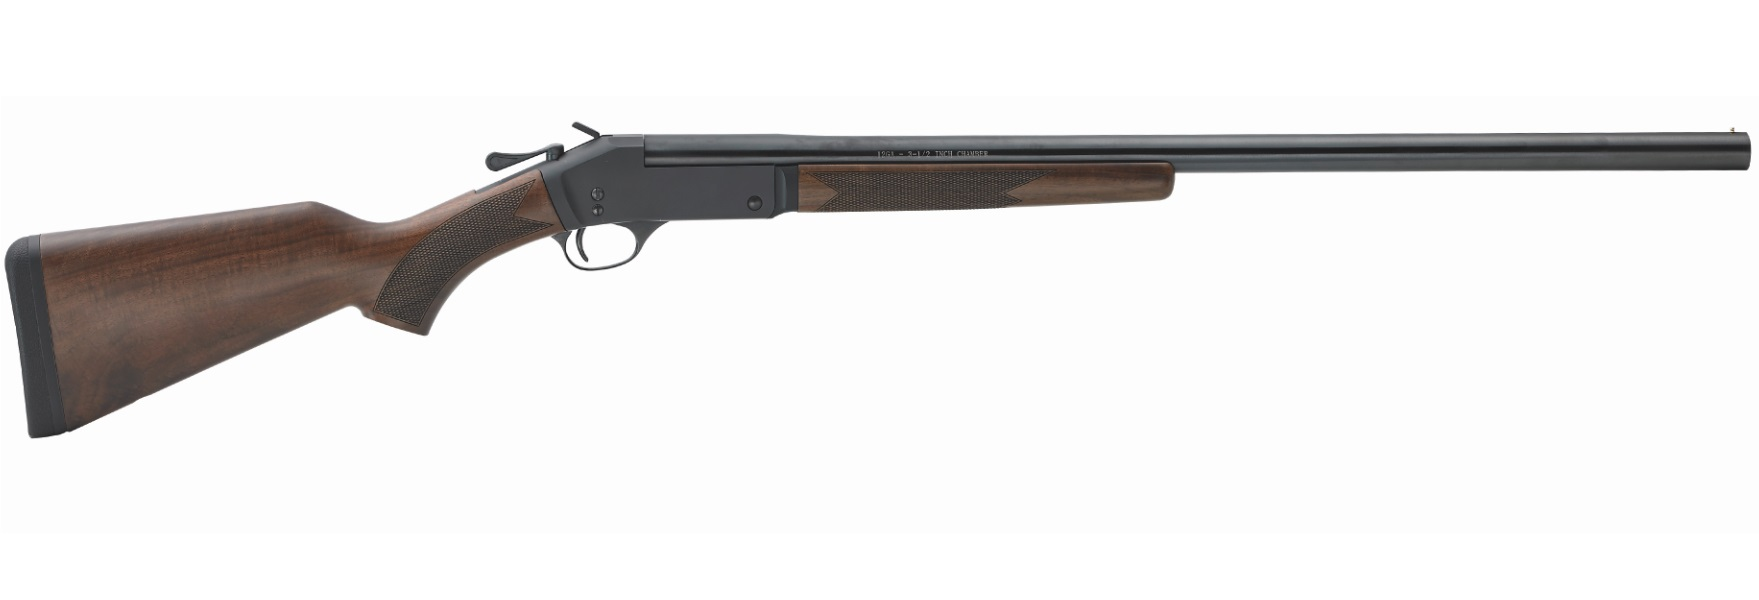 Henry Repeating Arms HENRY SINGLESHOT SHOTGUN 410 BORE